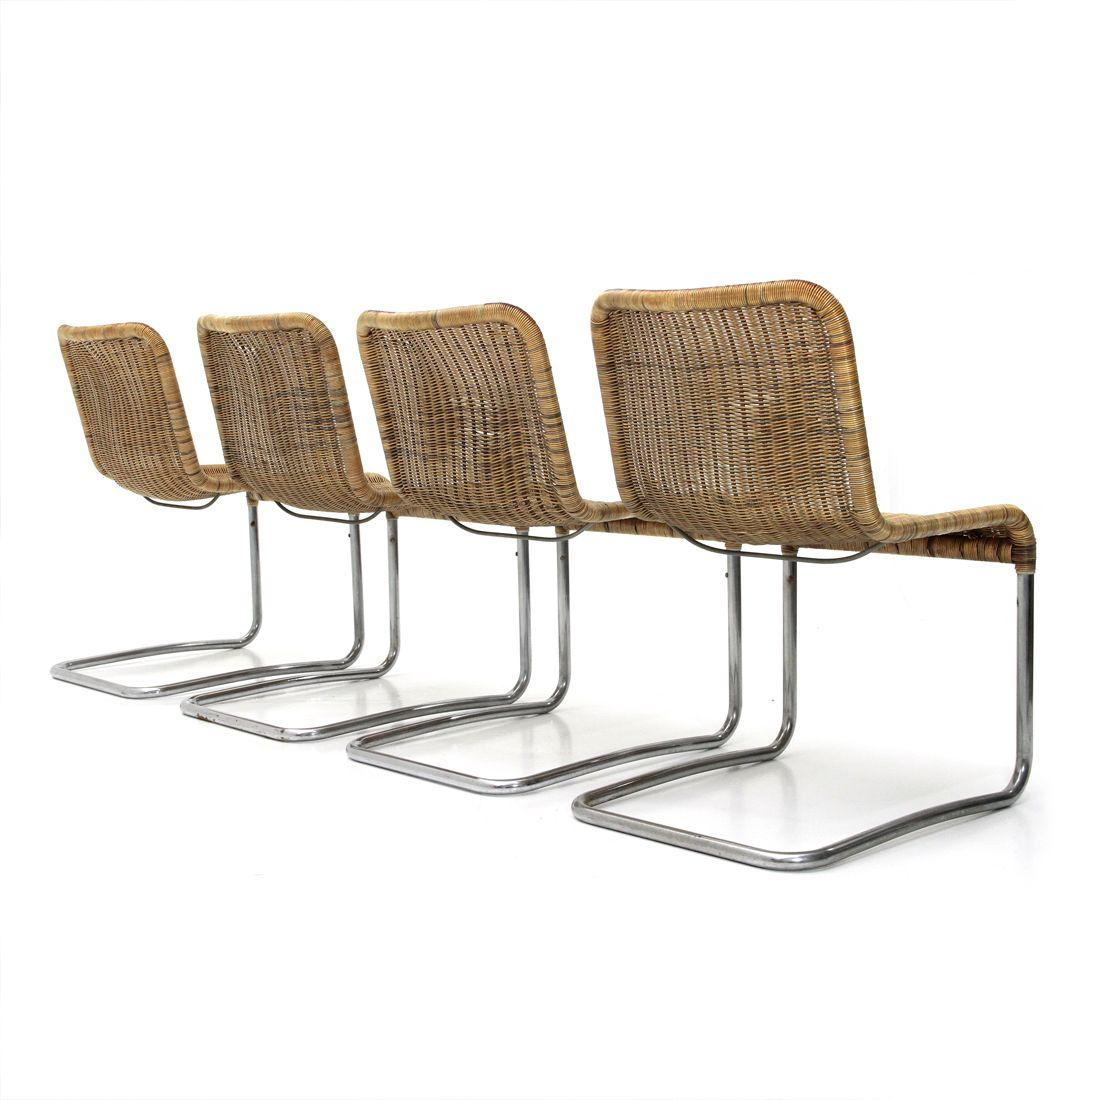 chrome dining chairs australia ergonomic chair ultrasound italian 1970s set of 4 en vente sur